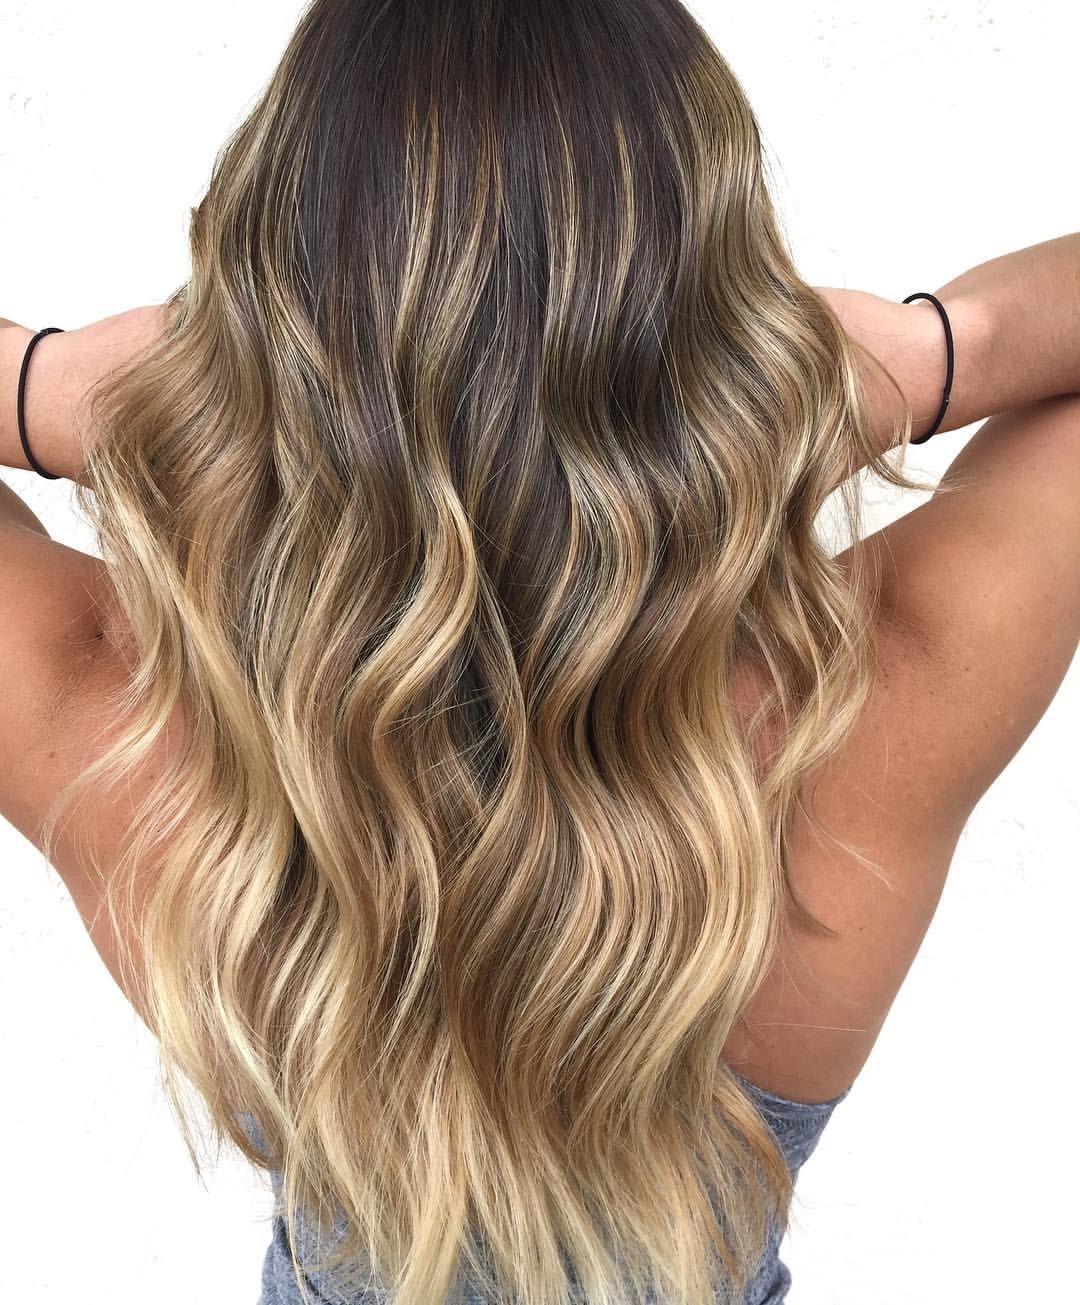 Sun Kissed Blonde Balayage Balayage Highlights On Brunette Hair